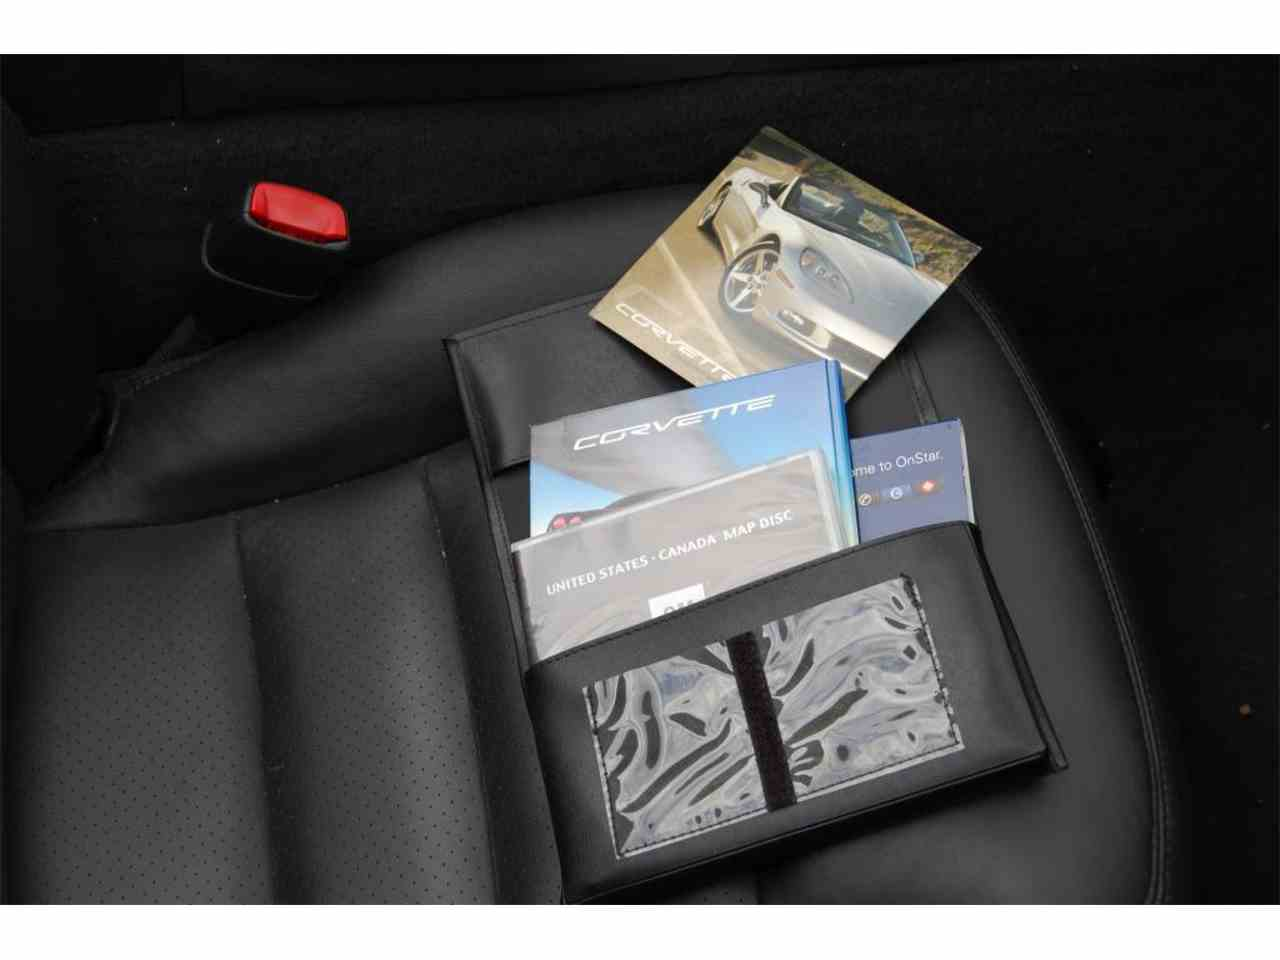 Large Picture of 2006 Chevrolet Corvette located in Tempe Arizona - $25,499.00 - L1ZB